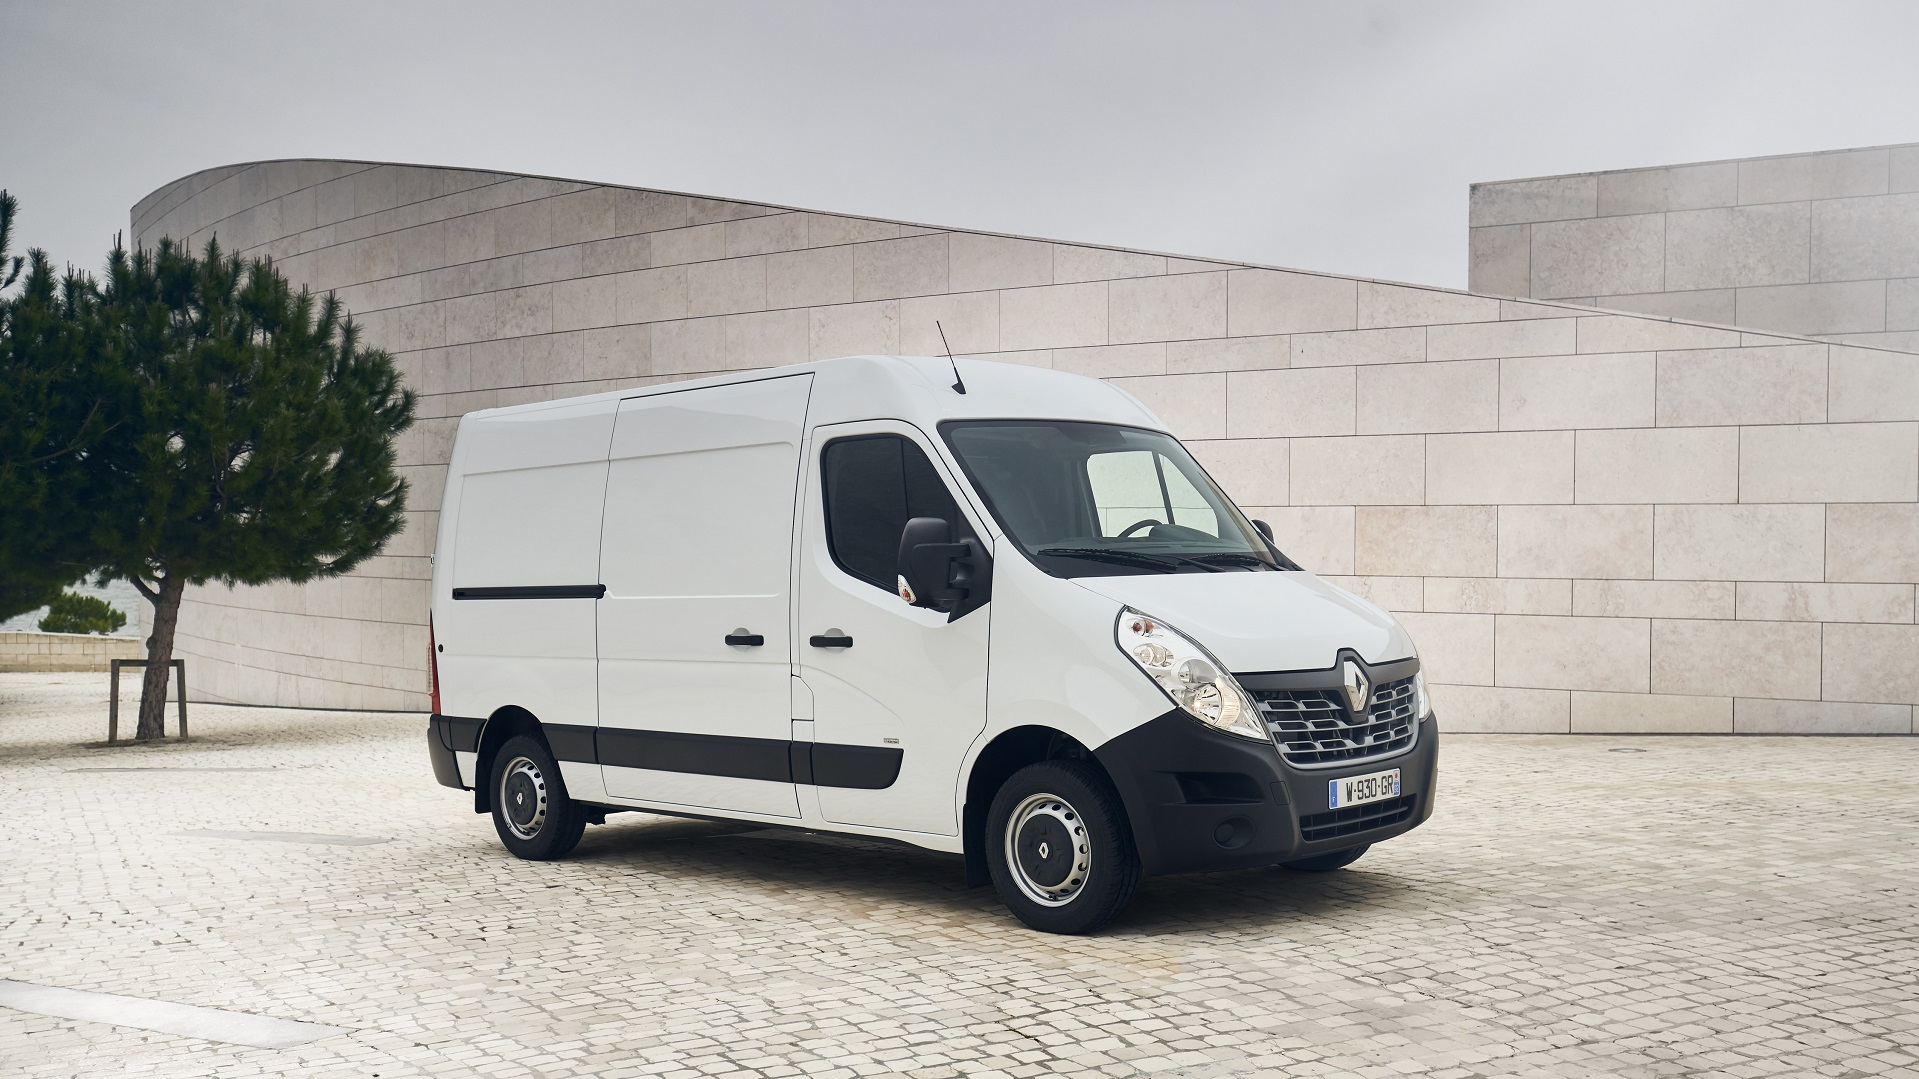 1c2019c2ec Renault Master used vans for sale on Auto Trader UK